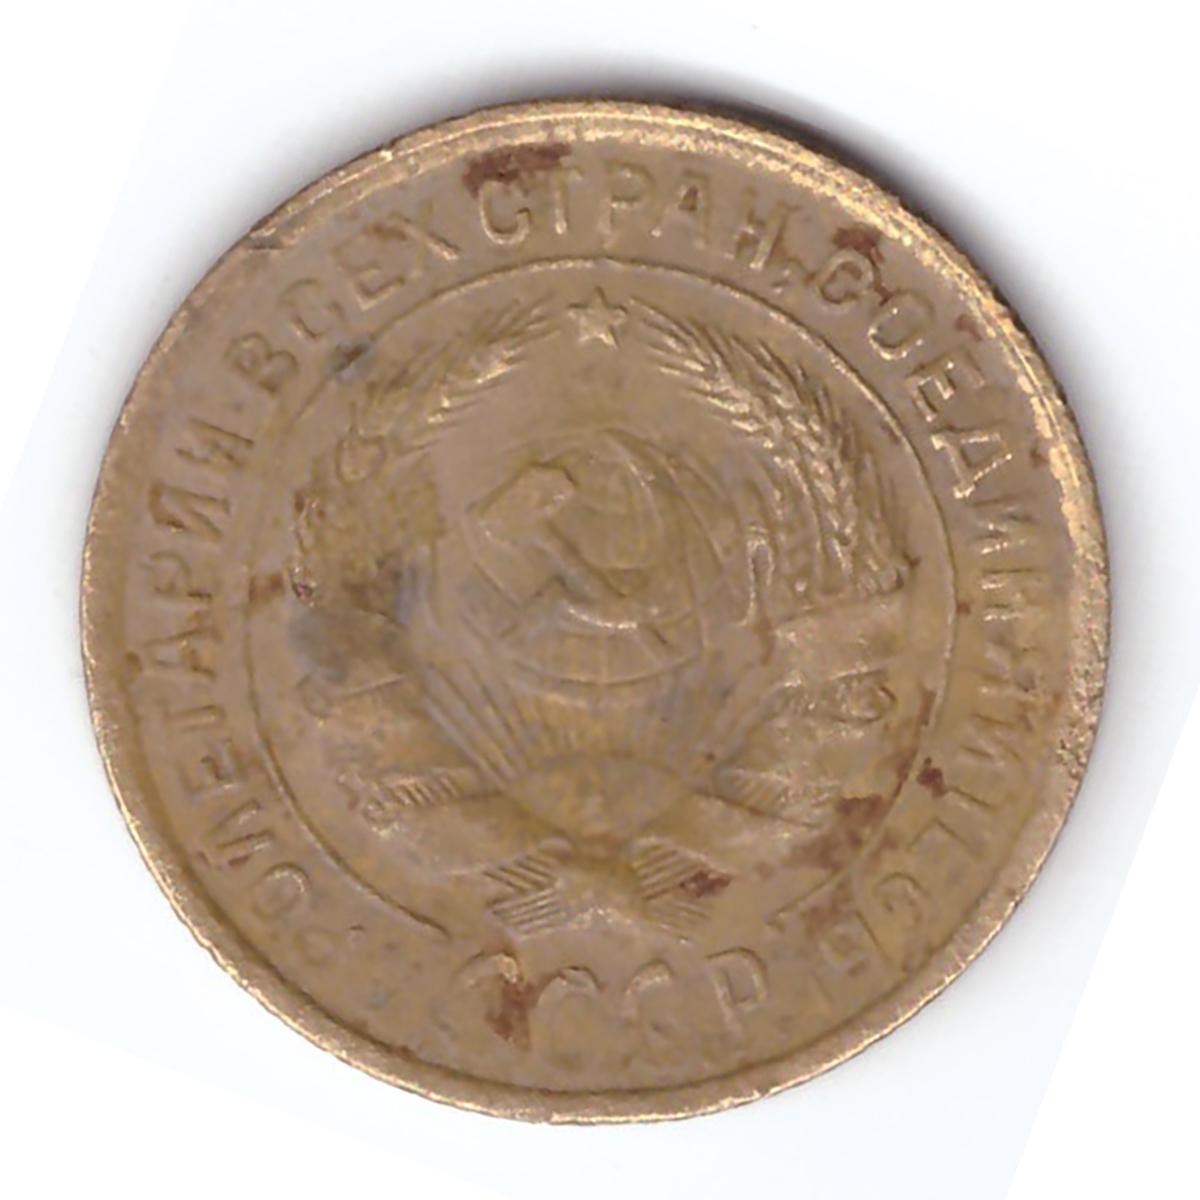 2 копейки 1932 года. F №2